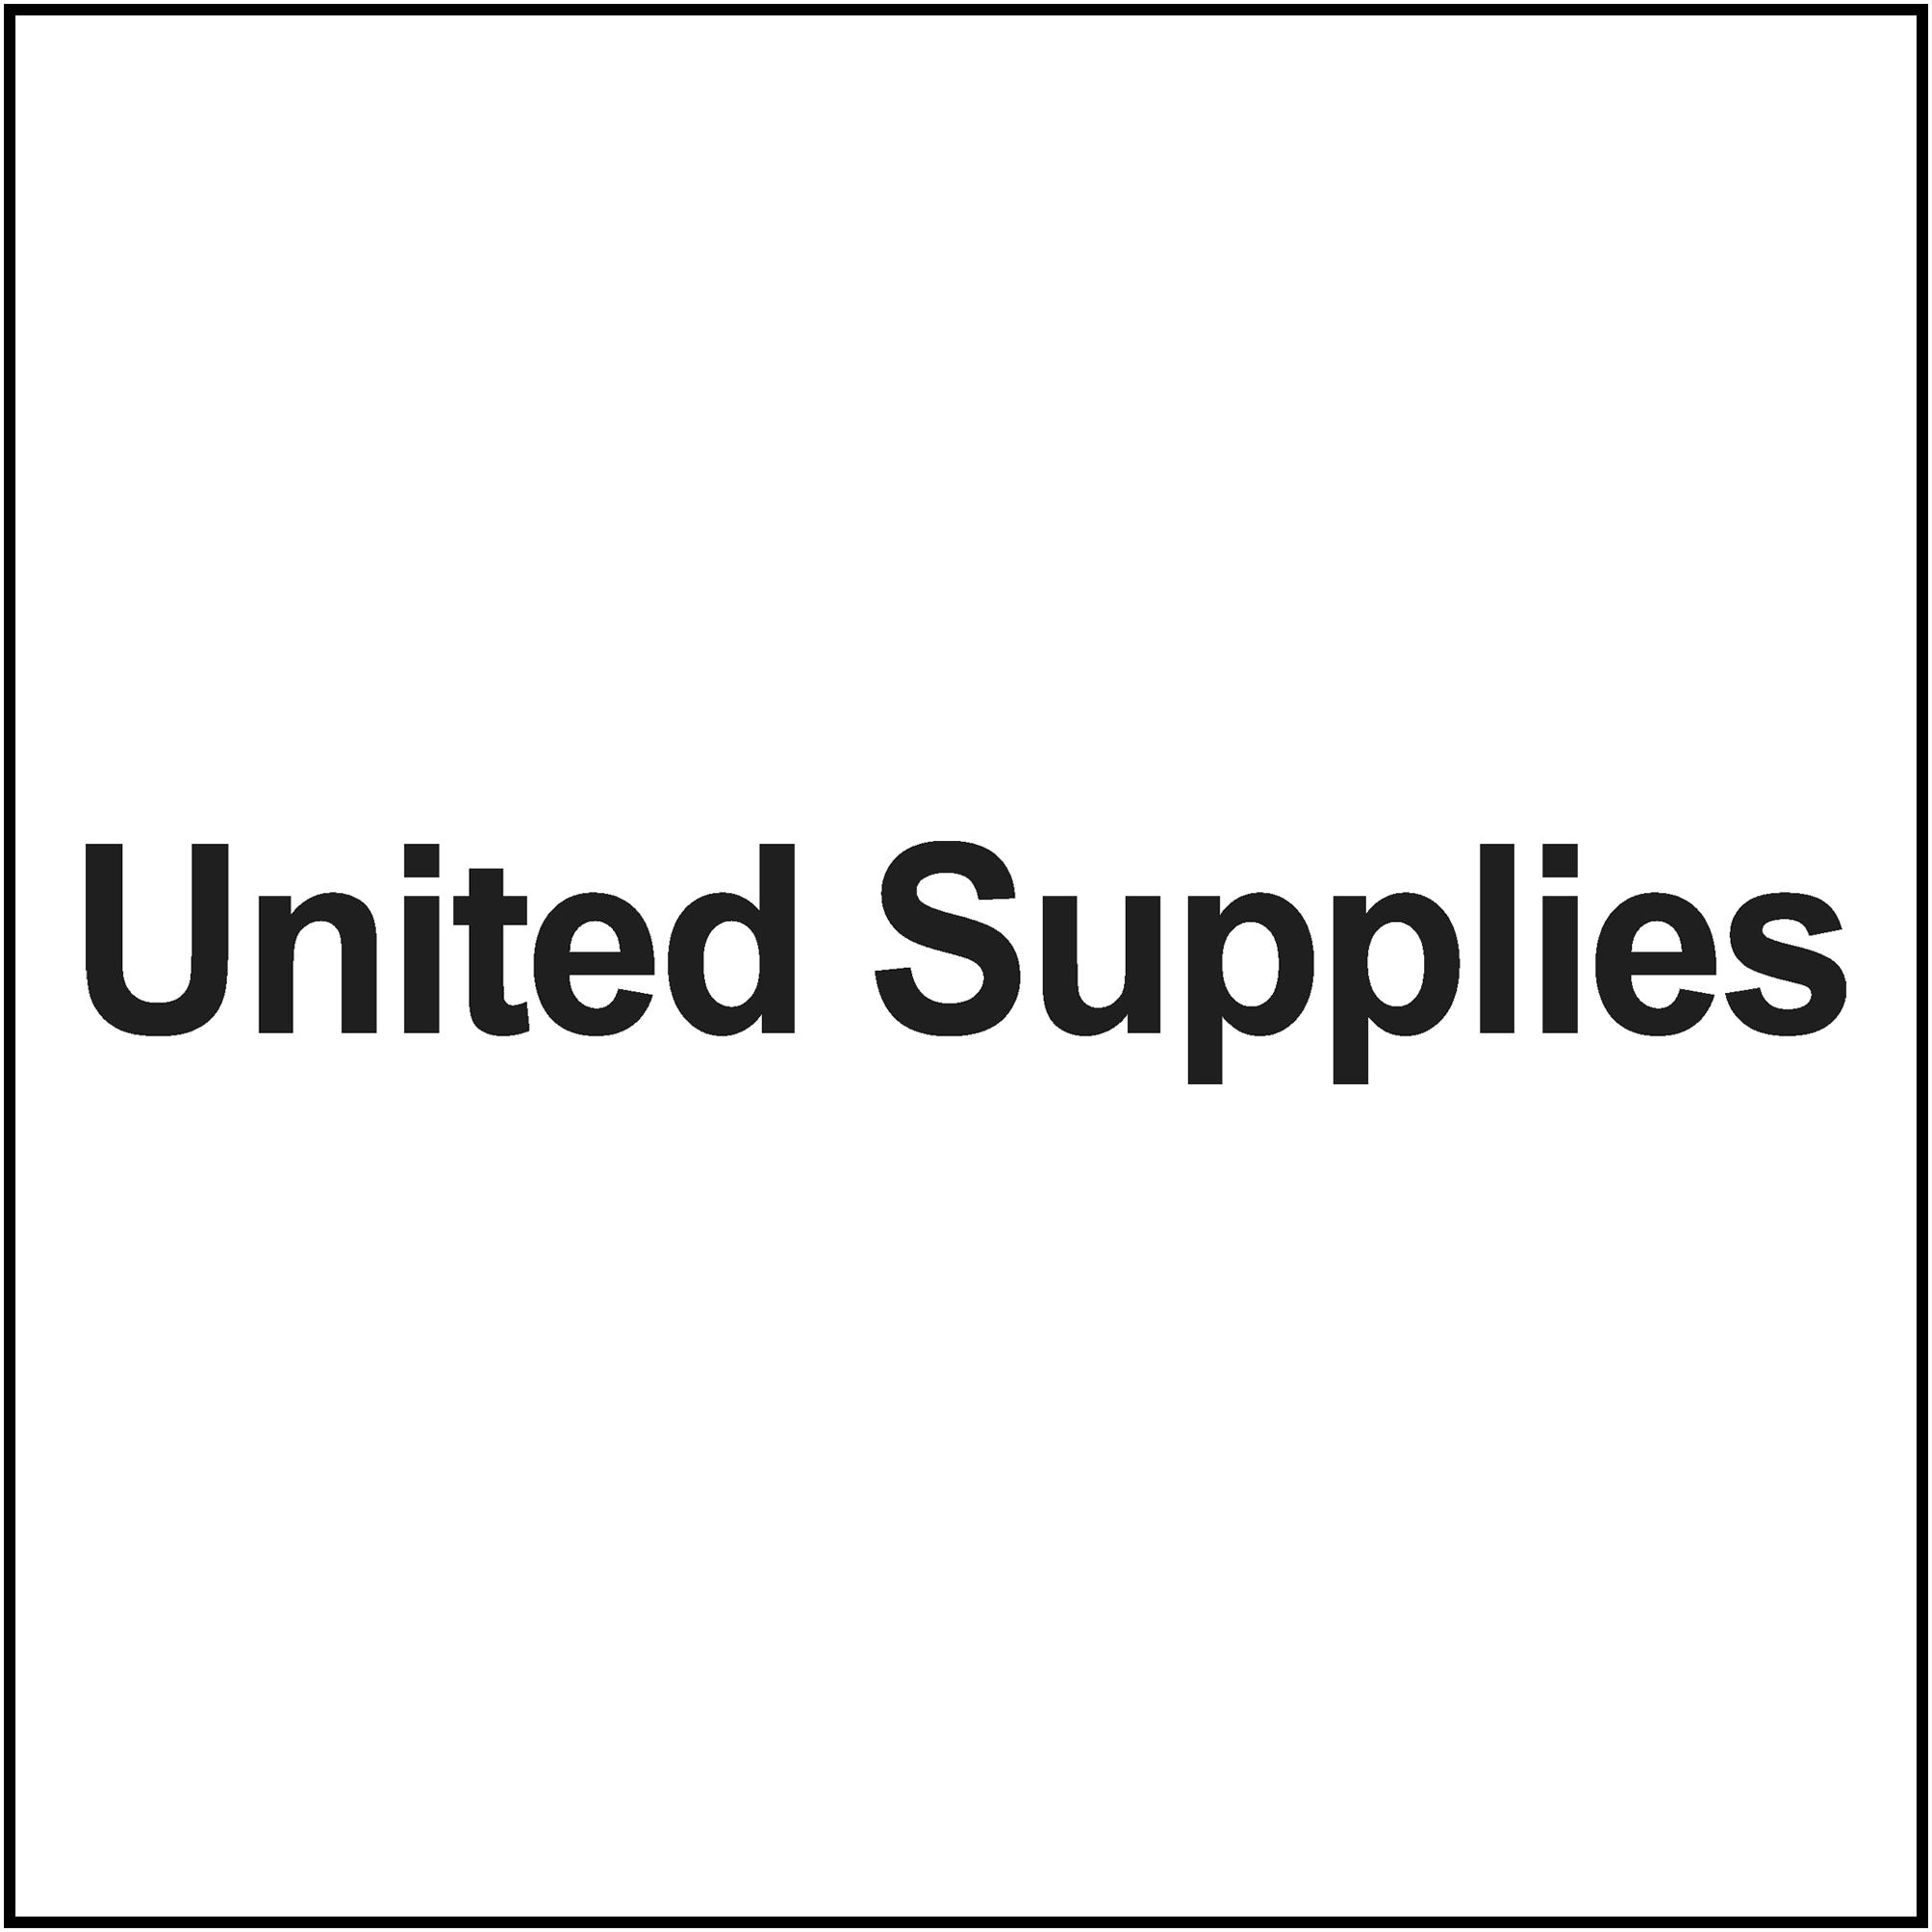 UNited Supplies logo